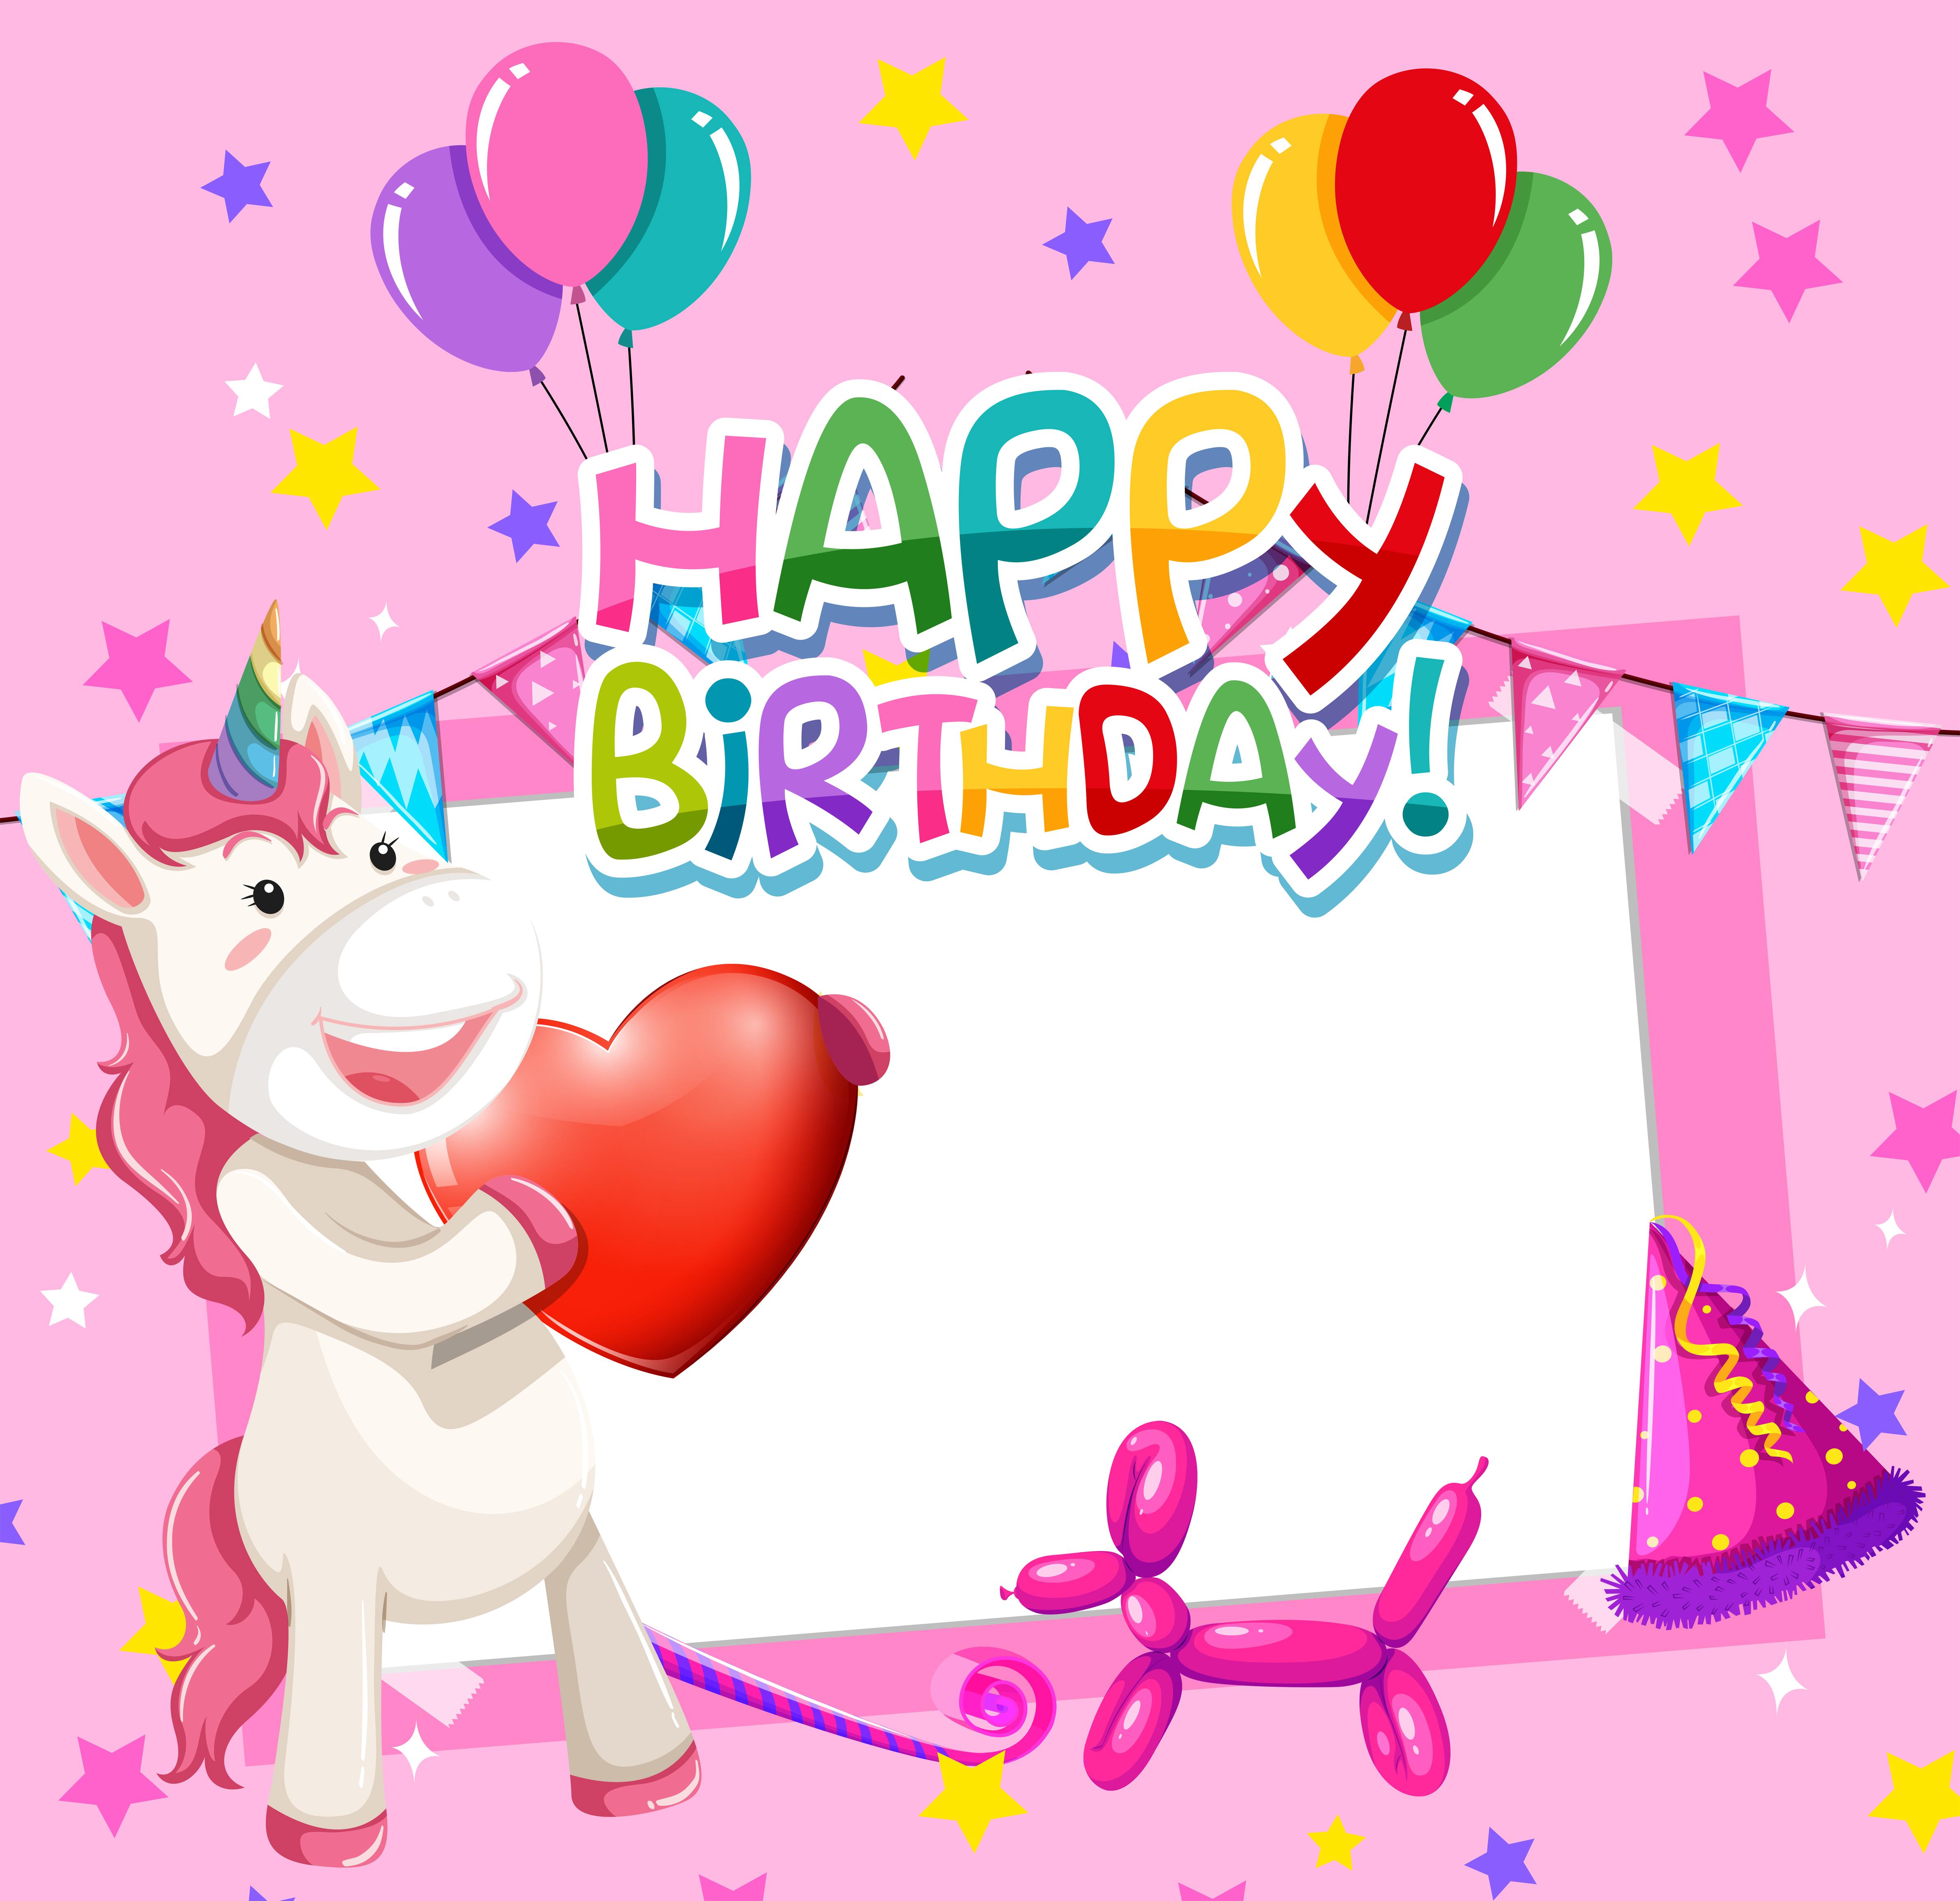 unicorn on birthday frame 541069 vector art at vecteezy